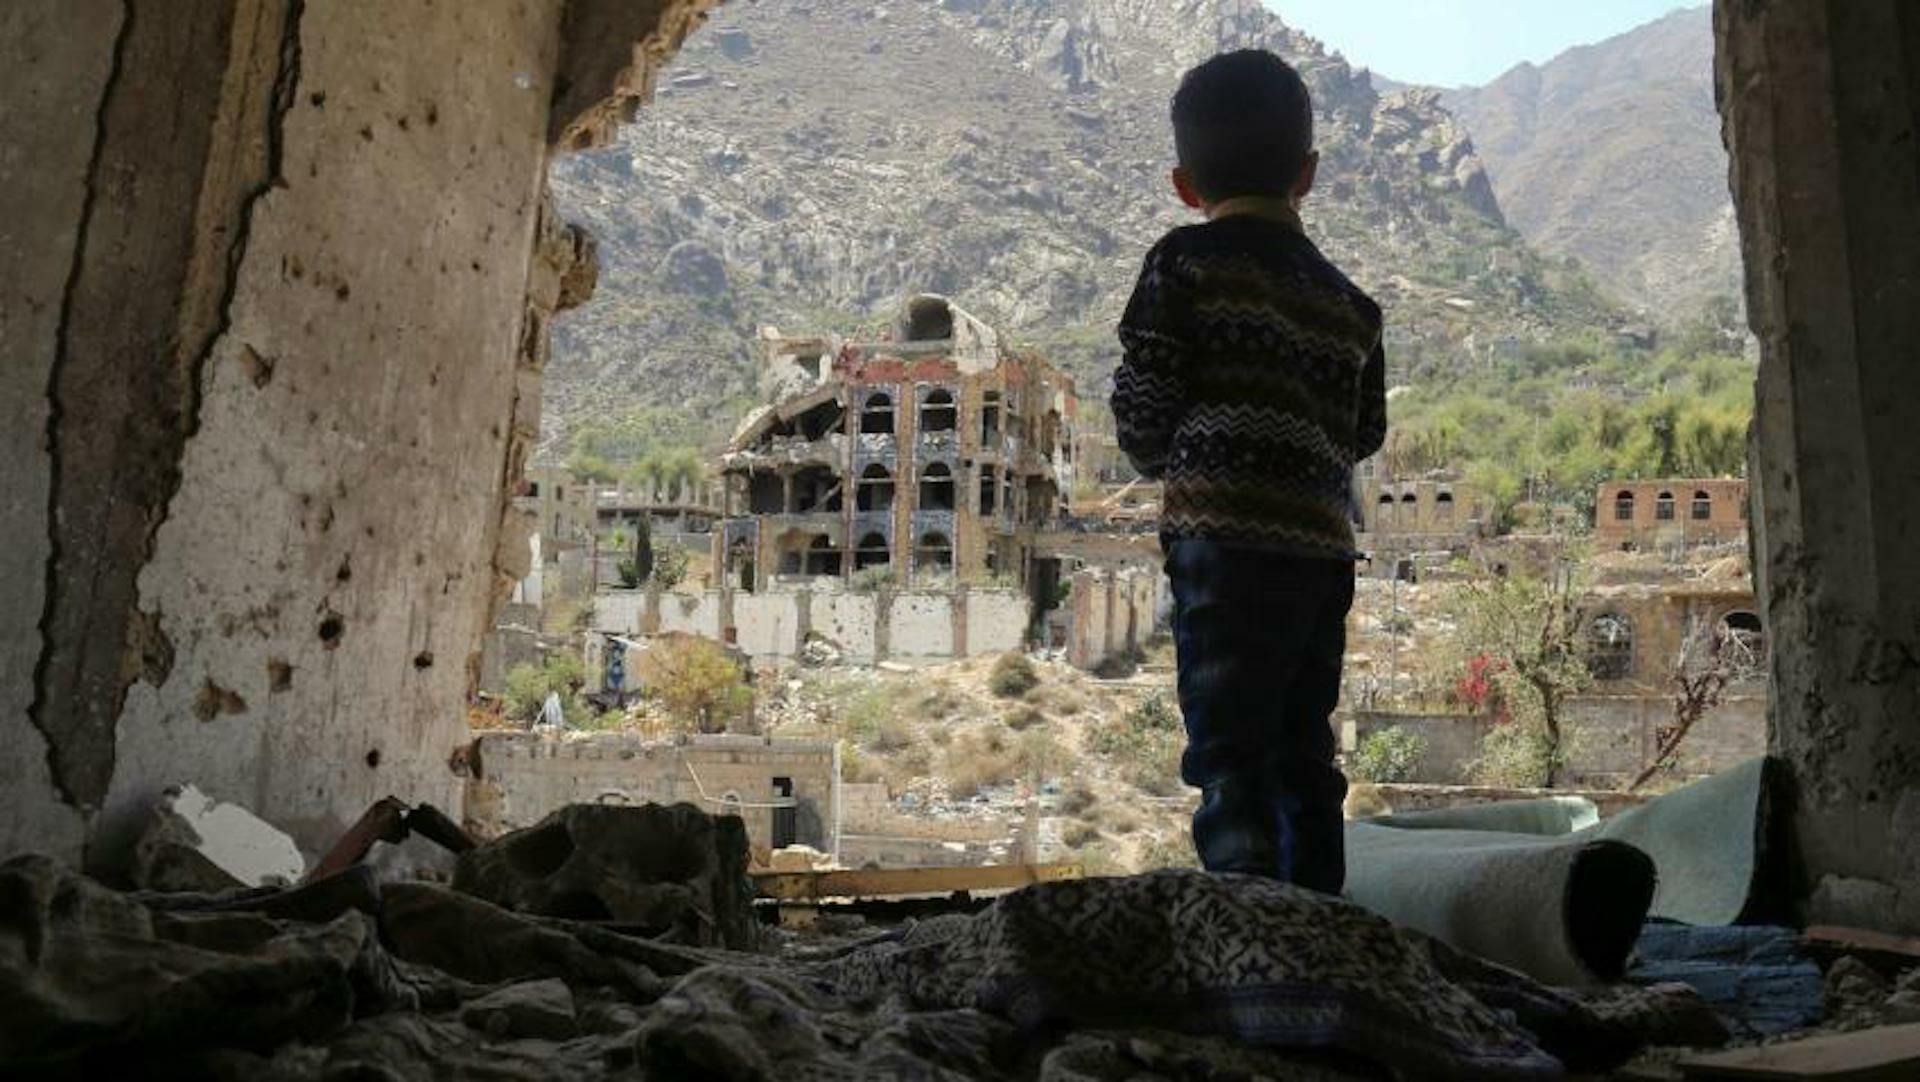 FAKTA: Krigen i Yemen